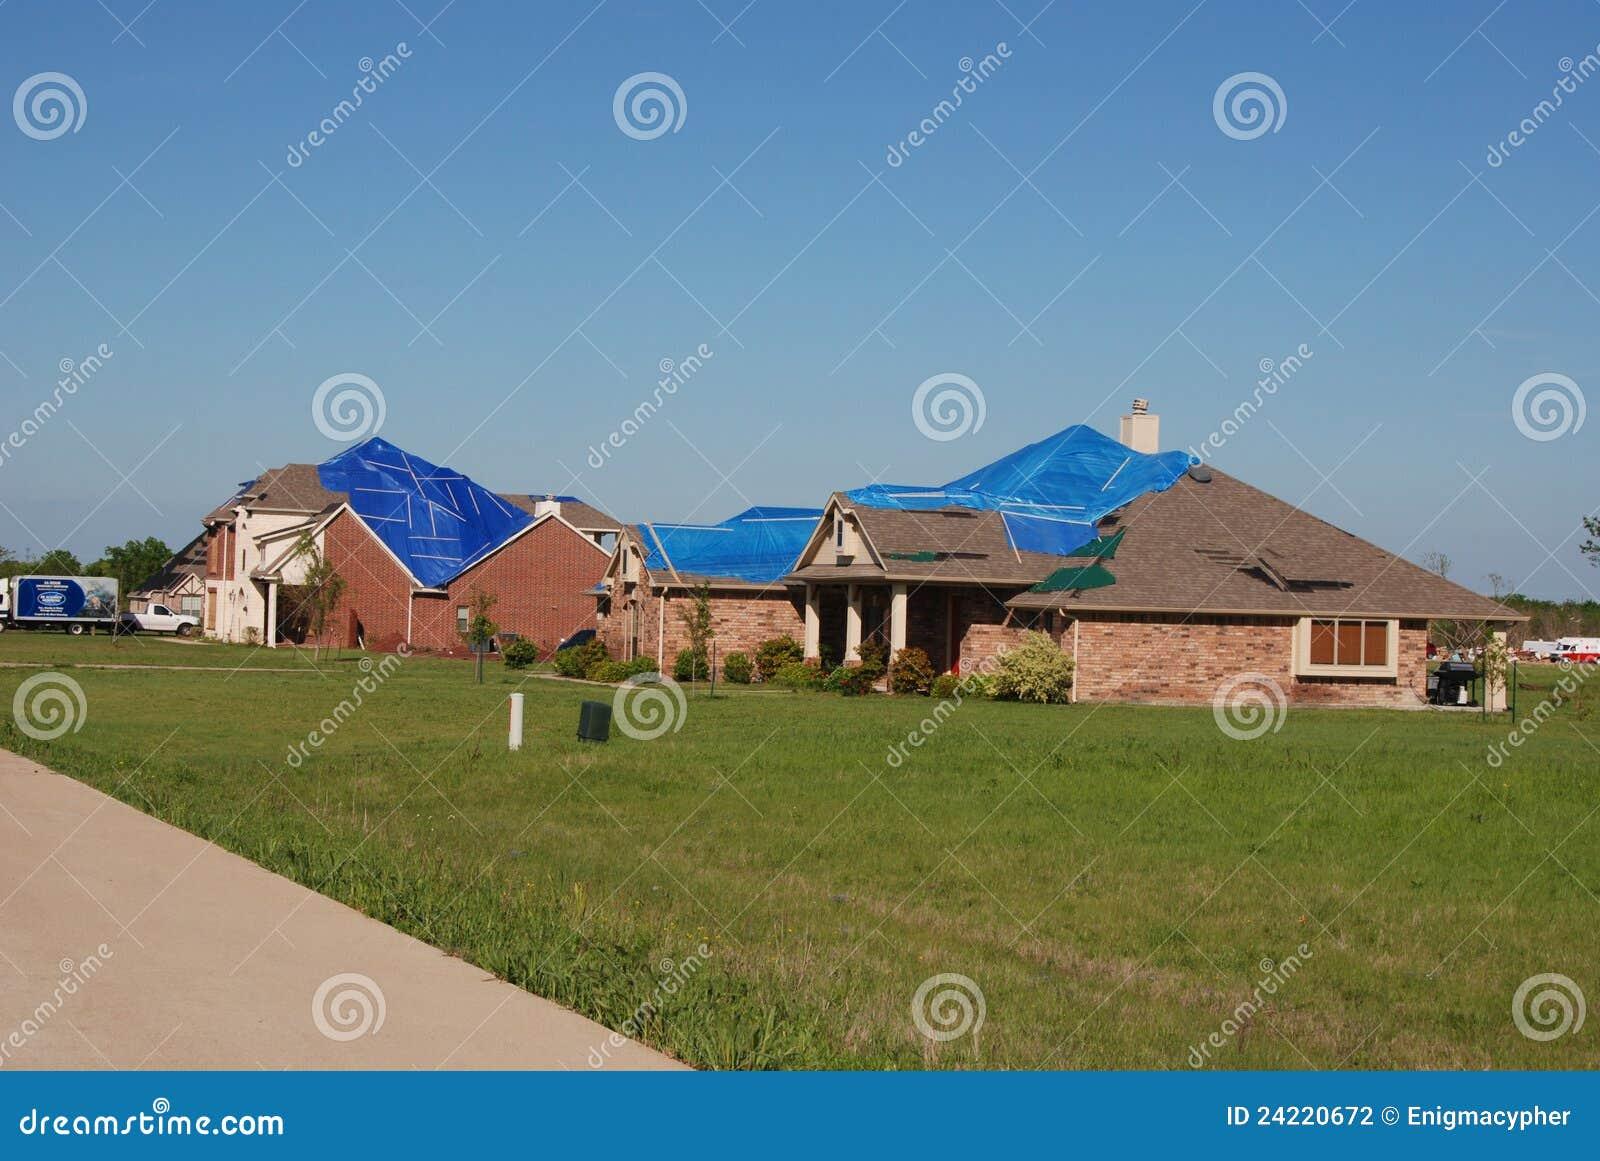 Texas Tornado - Roof Damage